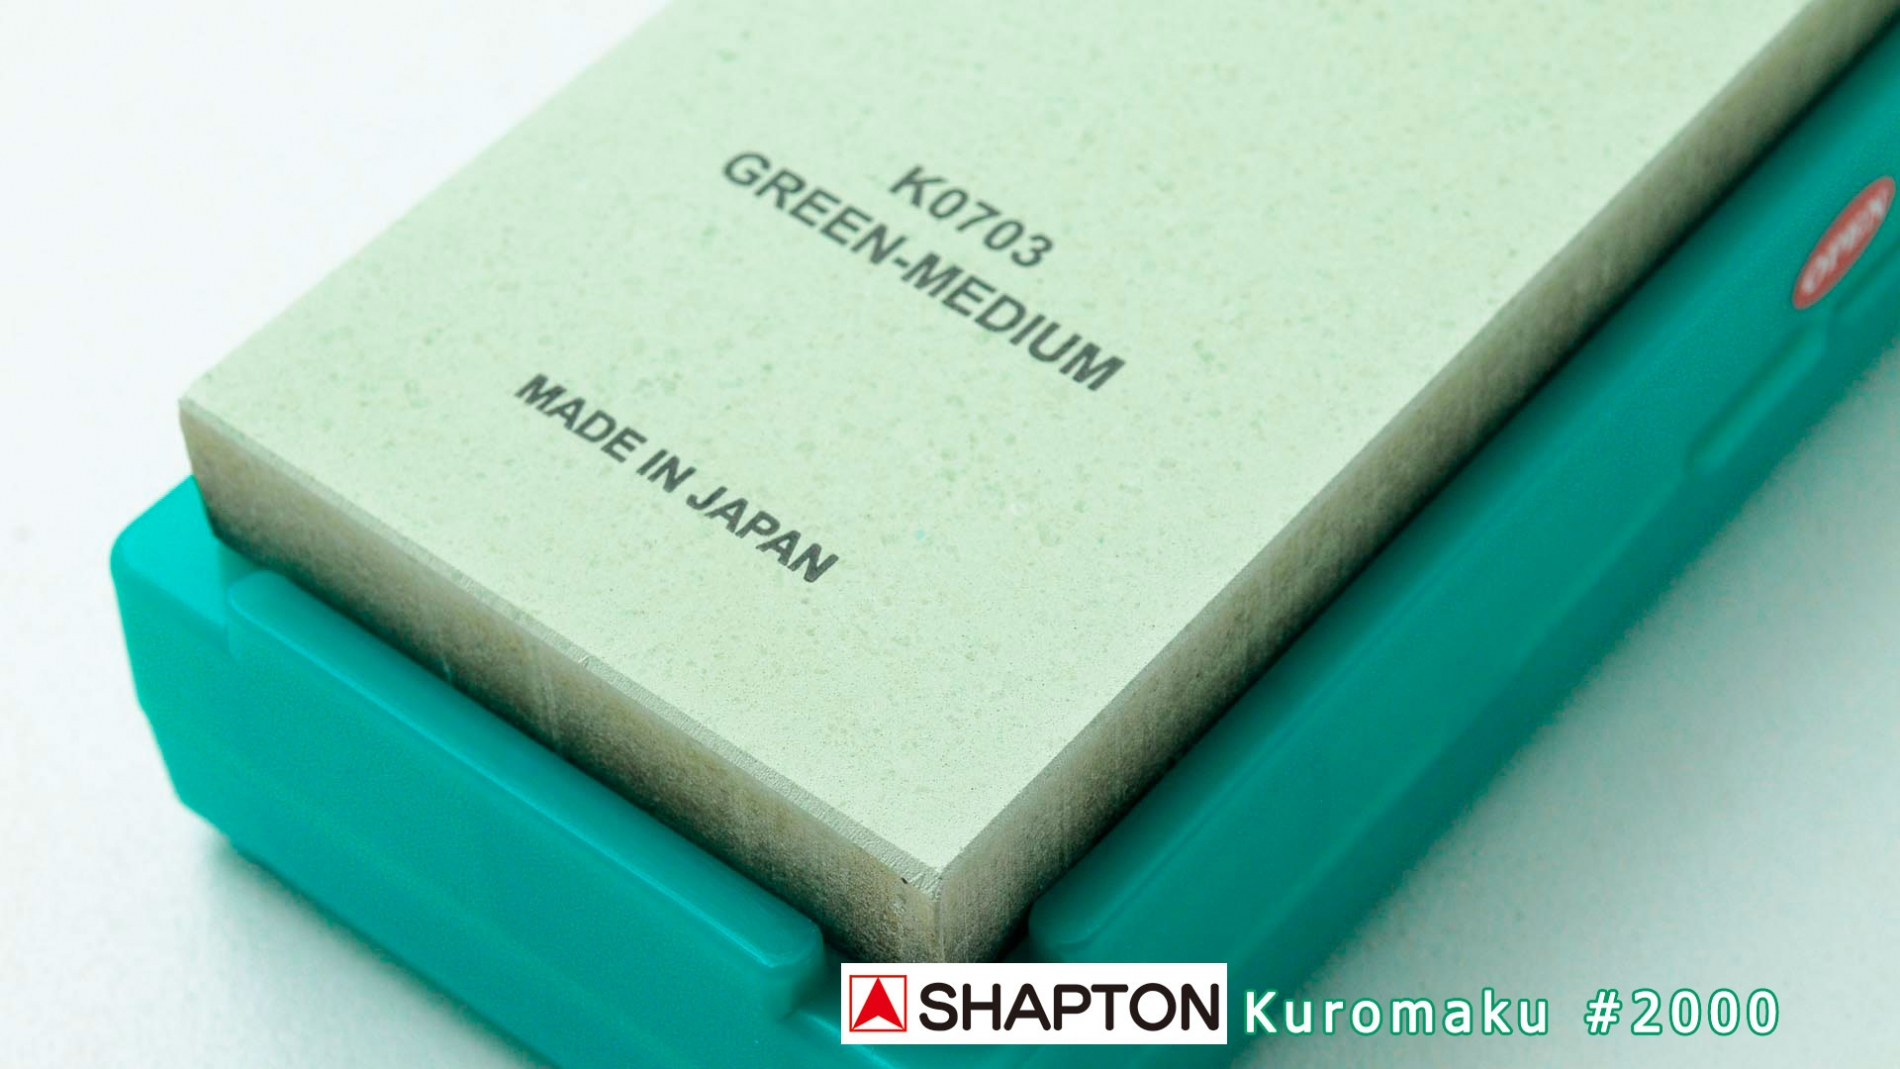 K0703-Piedra de asentar 2000 Shapton Kuromaku K0703-max-3.